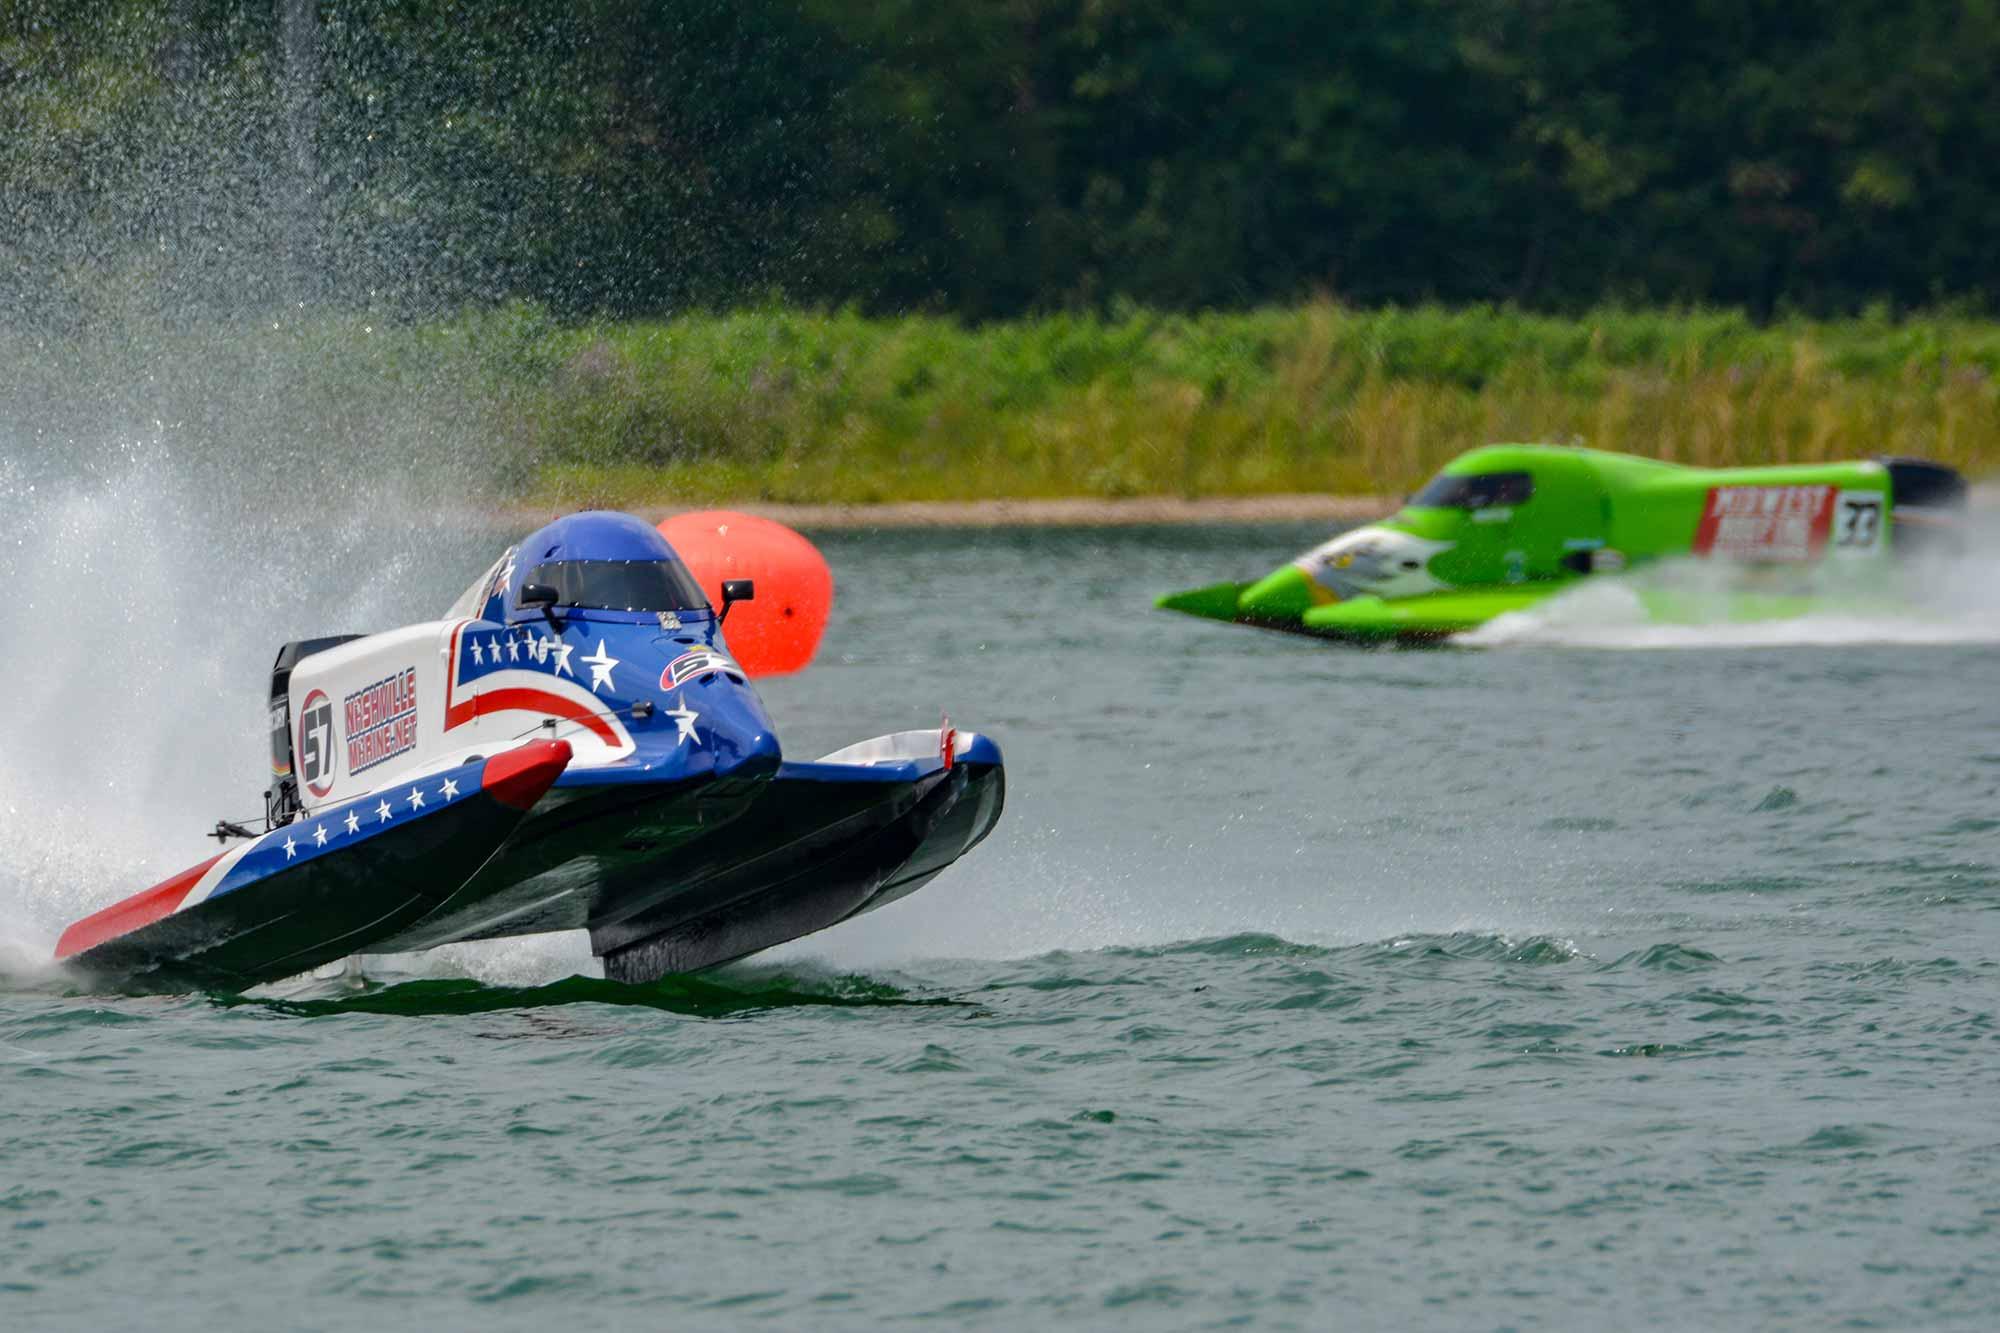 McMurray-Racing-Nashvill-Marine-2021-Springfield-F1-Race-15